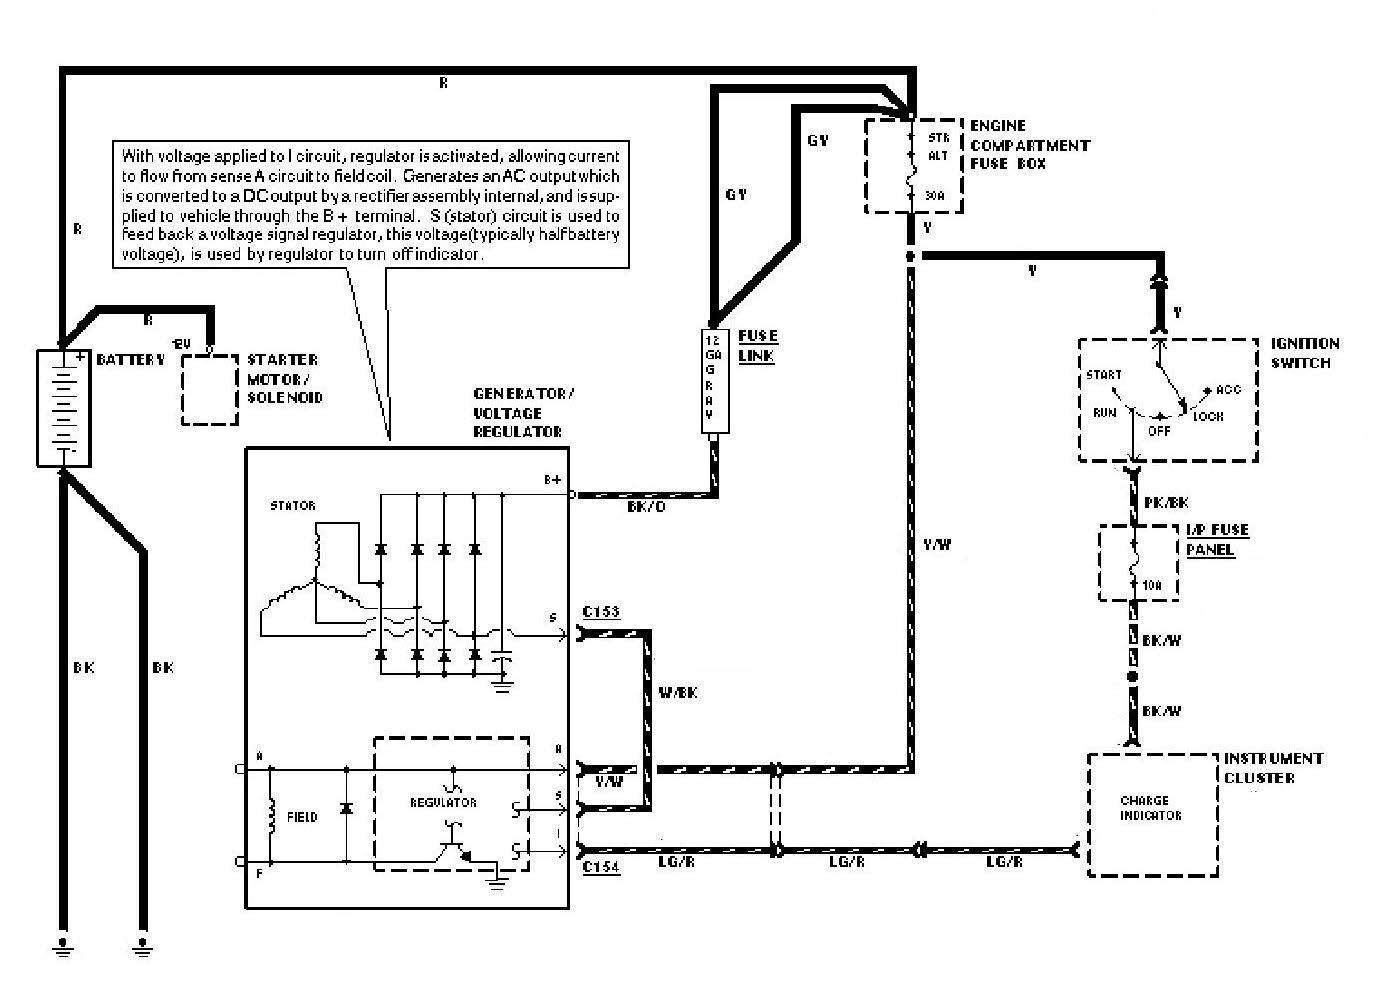 Internal Alternator Regulator Wiring Diagram | Schematic Diagram - Gm 4 Wire Alternator Wiring Diagram